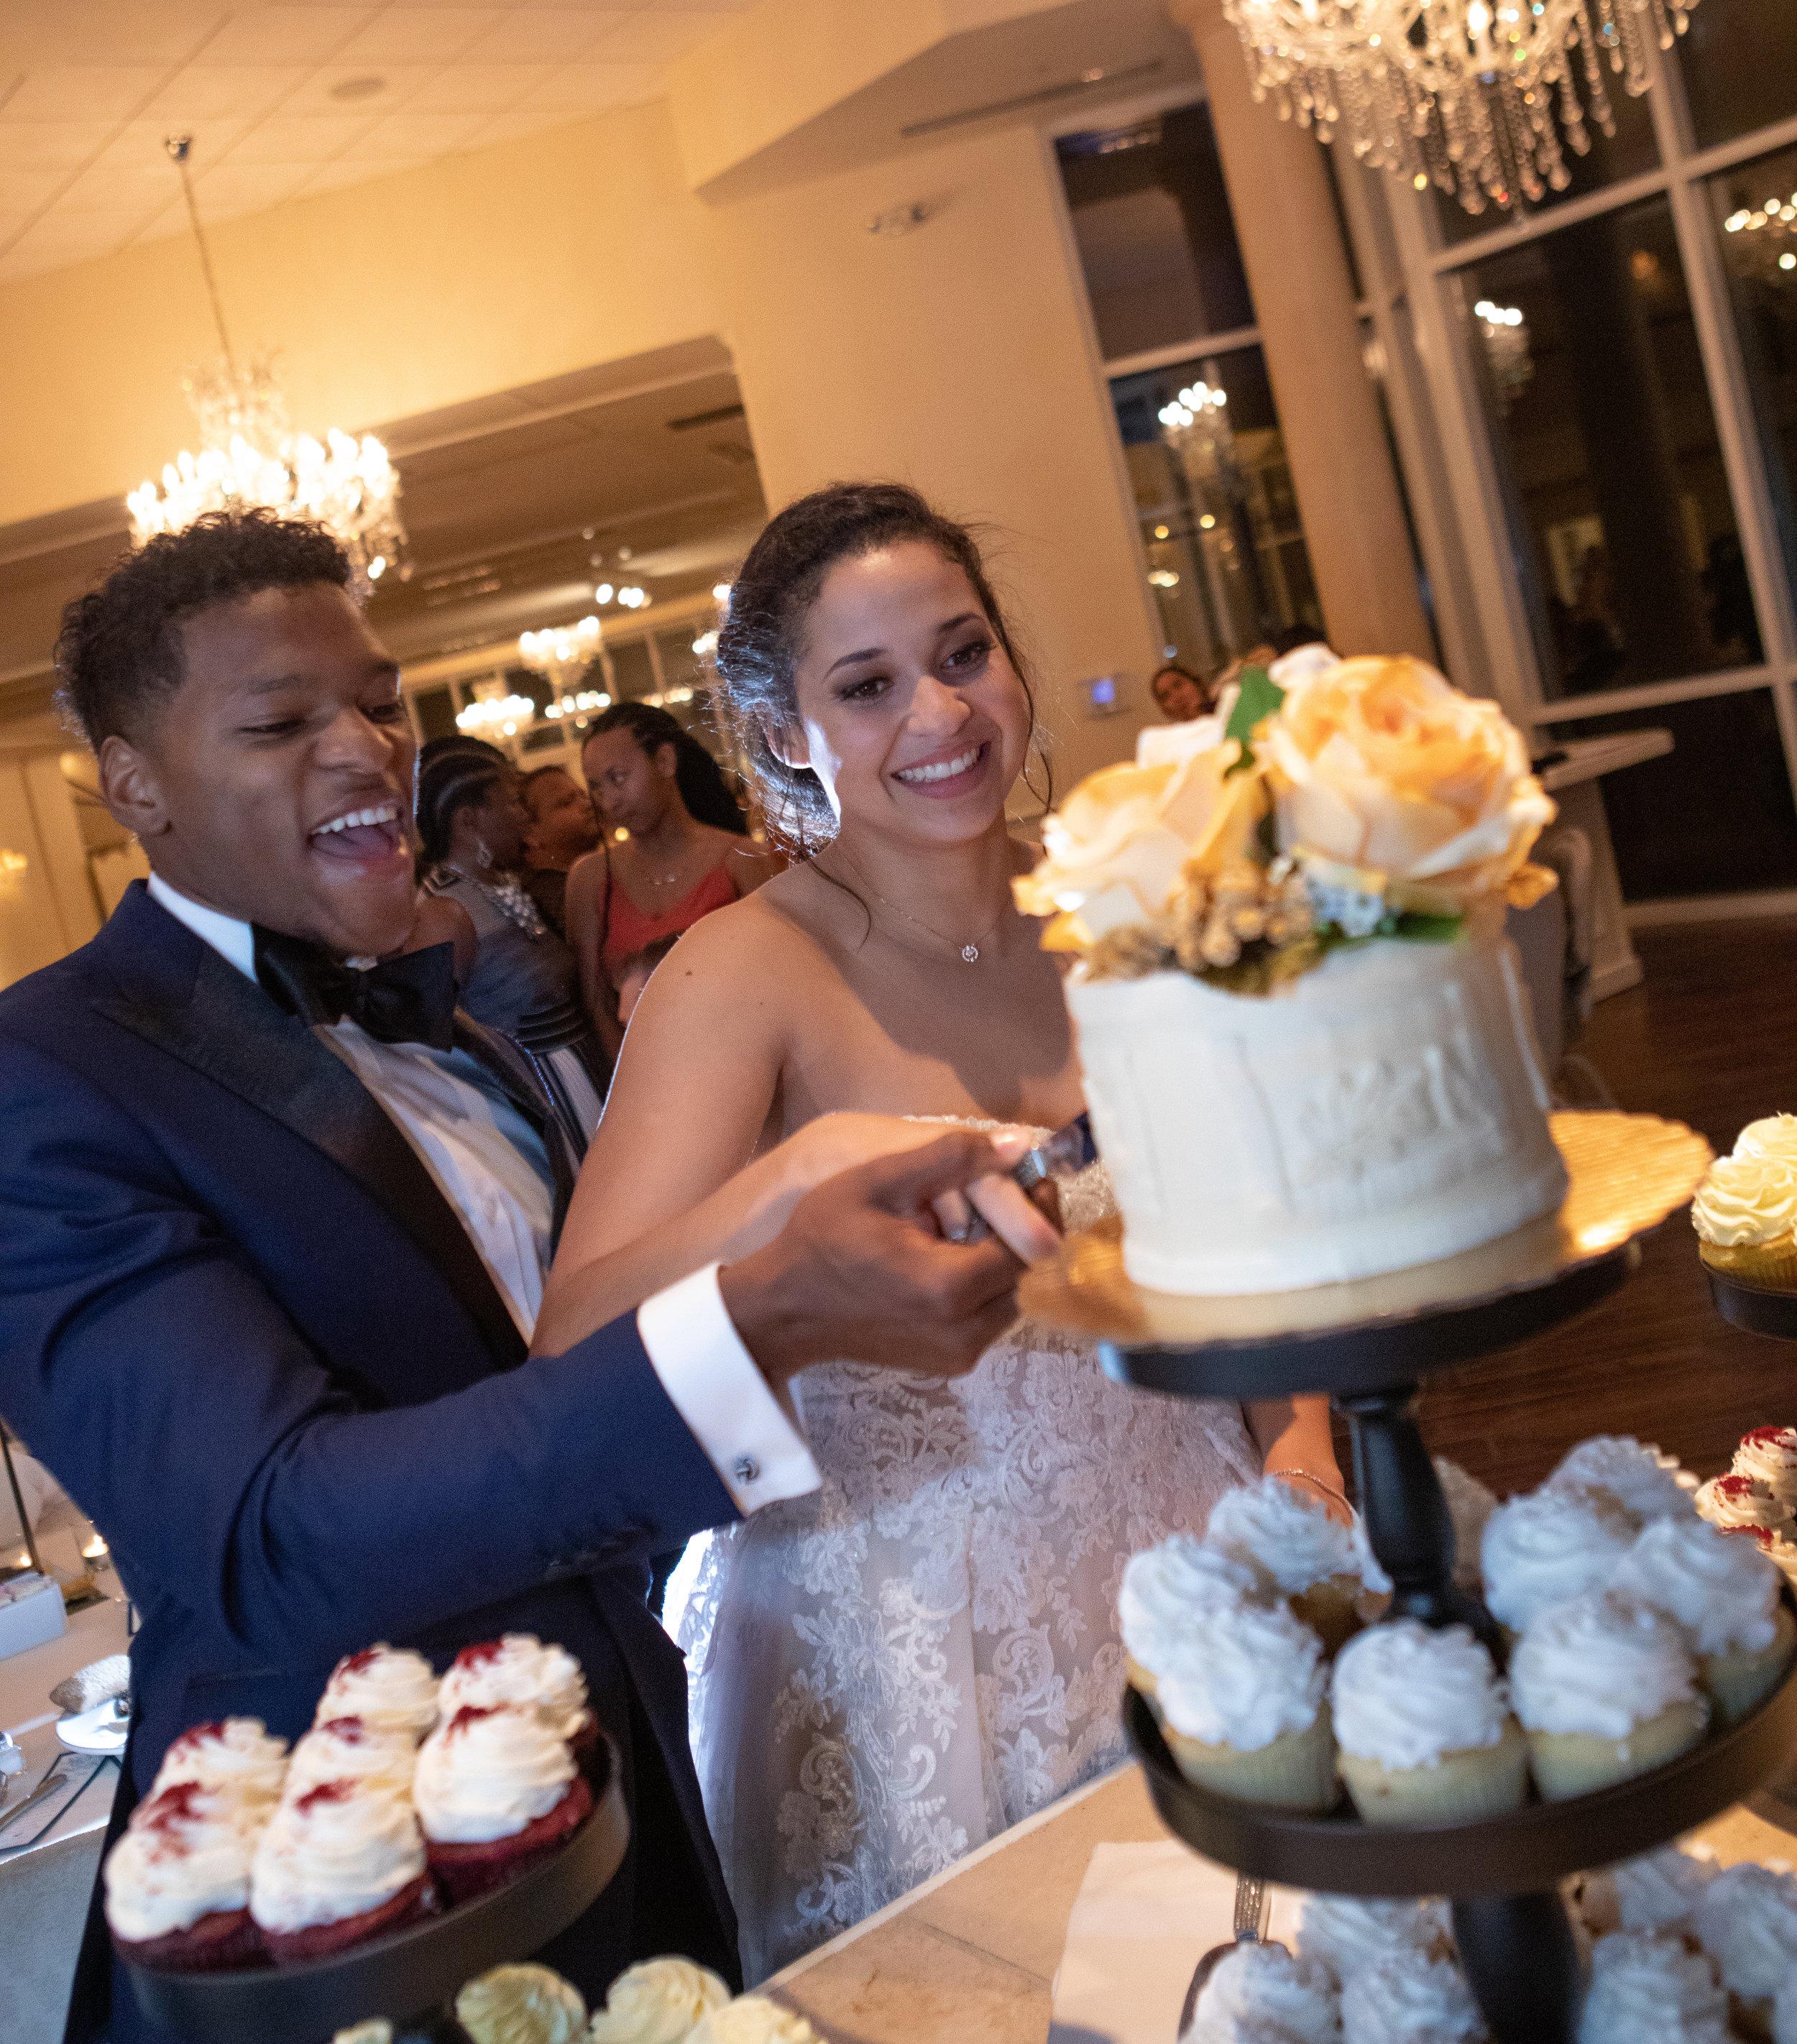 Cutting of the wedding cake photo by the Atlanta Wedding Photographers at AtlantaArtisticWeddings